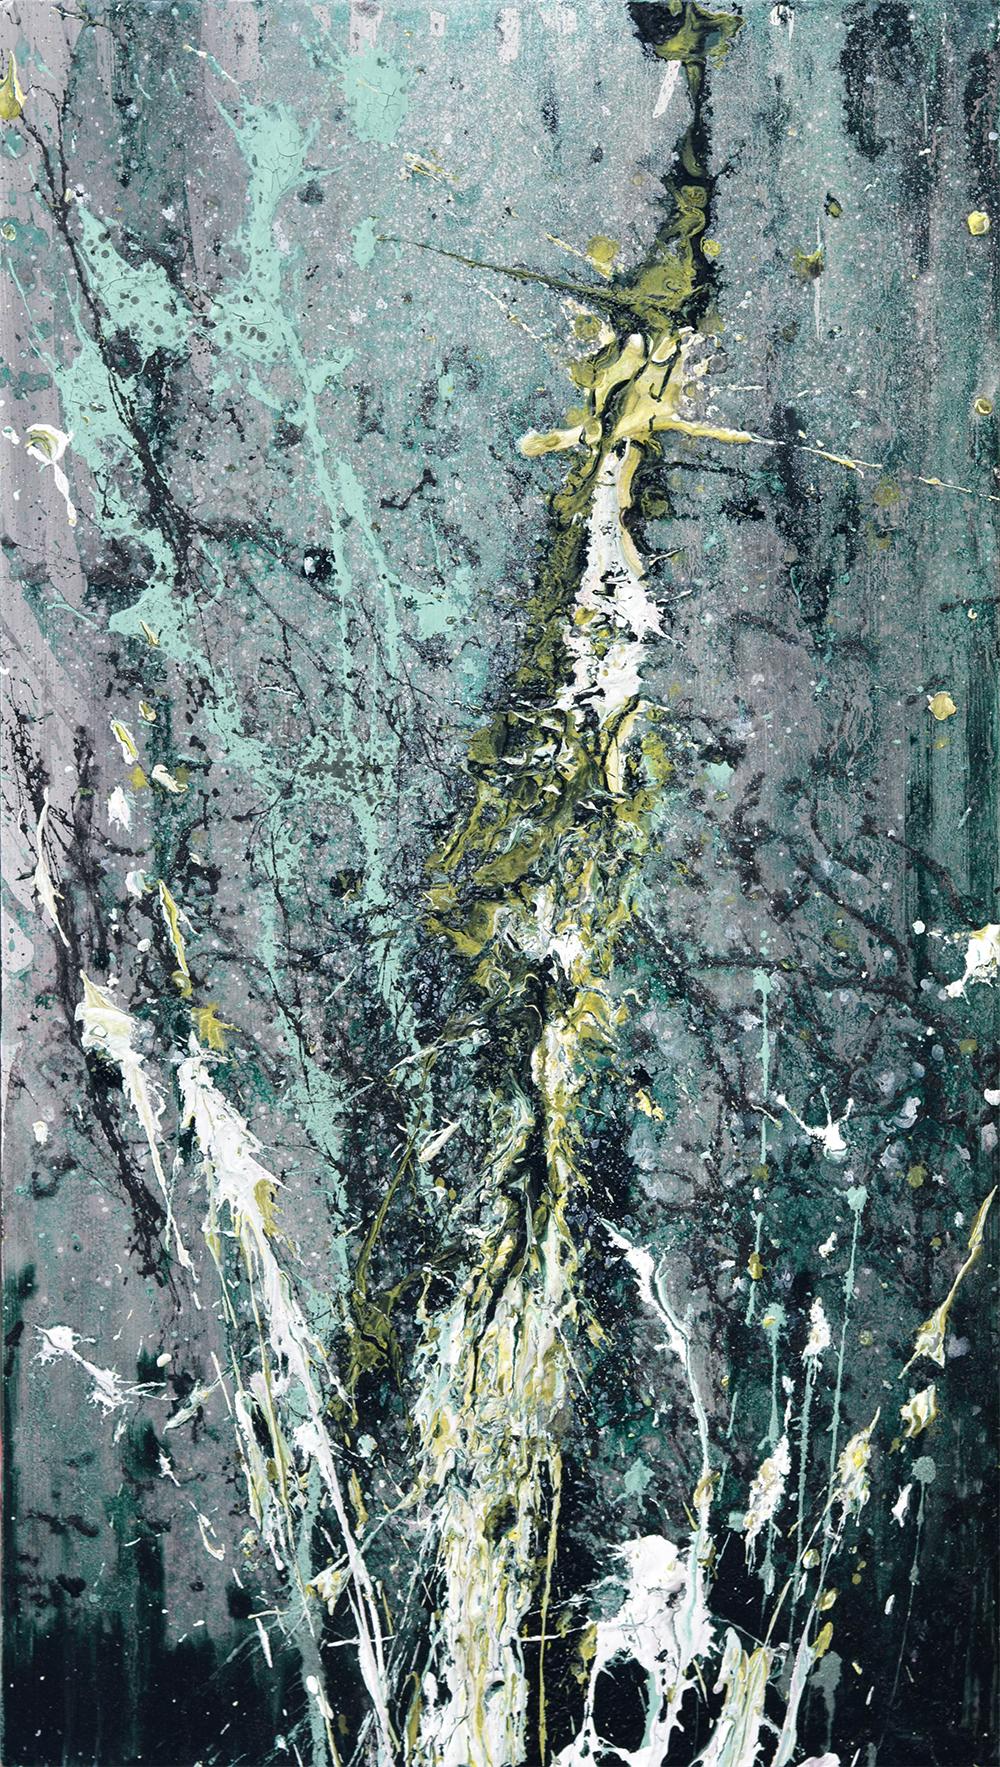 Ohne Titel | Acrylic, acrylic lacquer on wood | 50x28cm | 2015